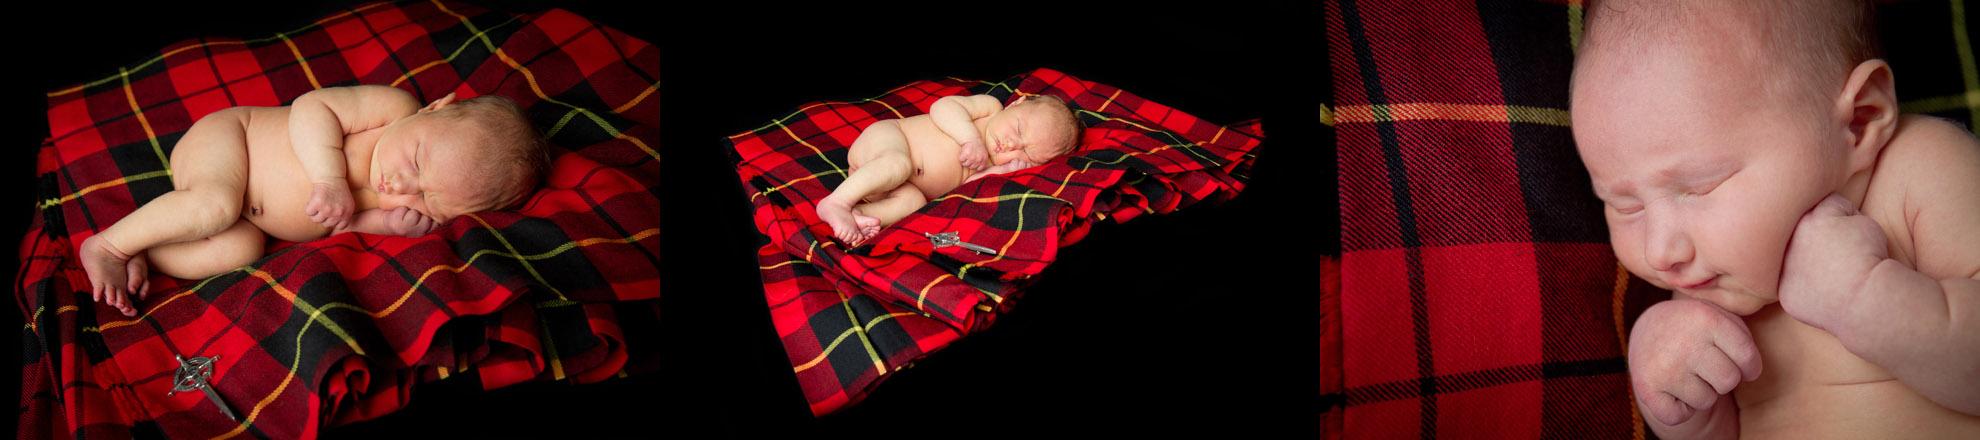 Newborn-photographs-with-family-tartan.jpg